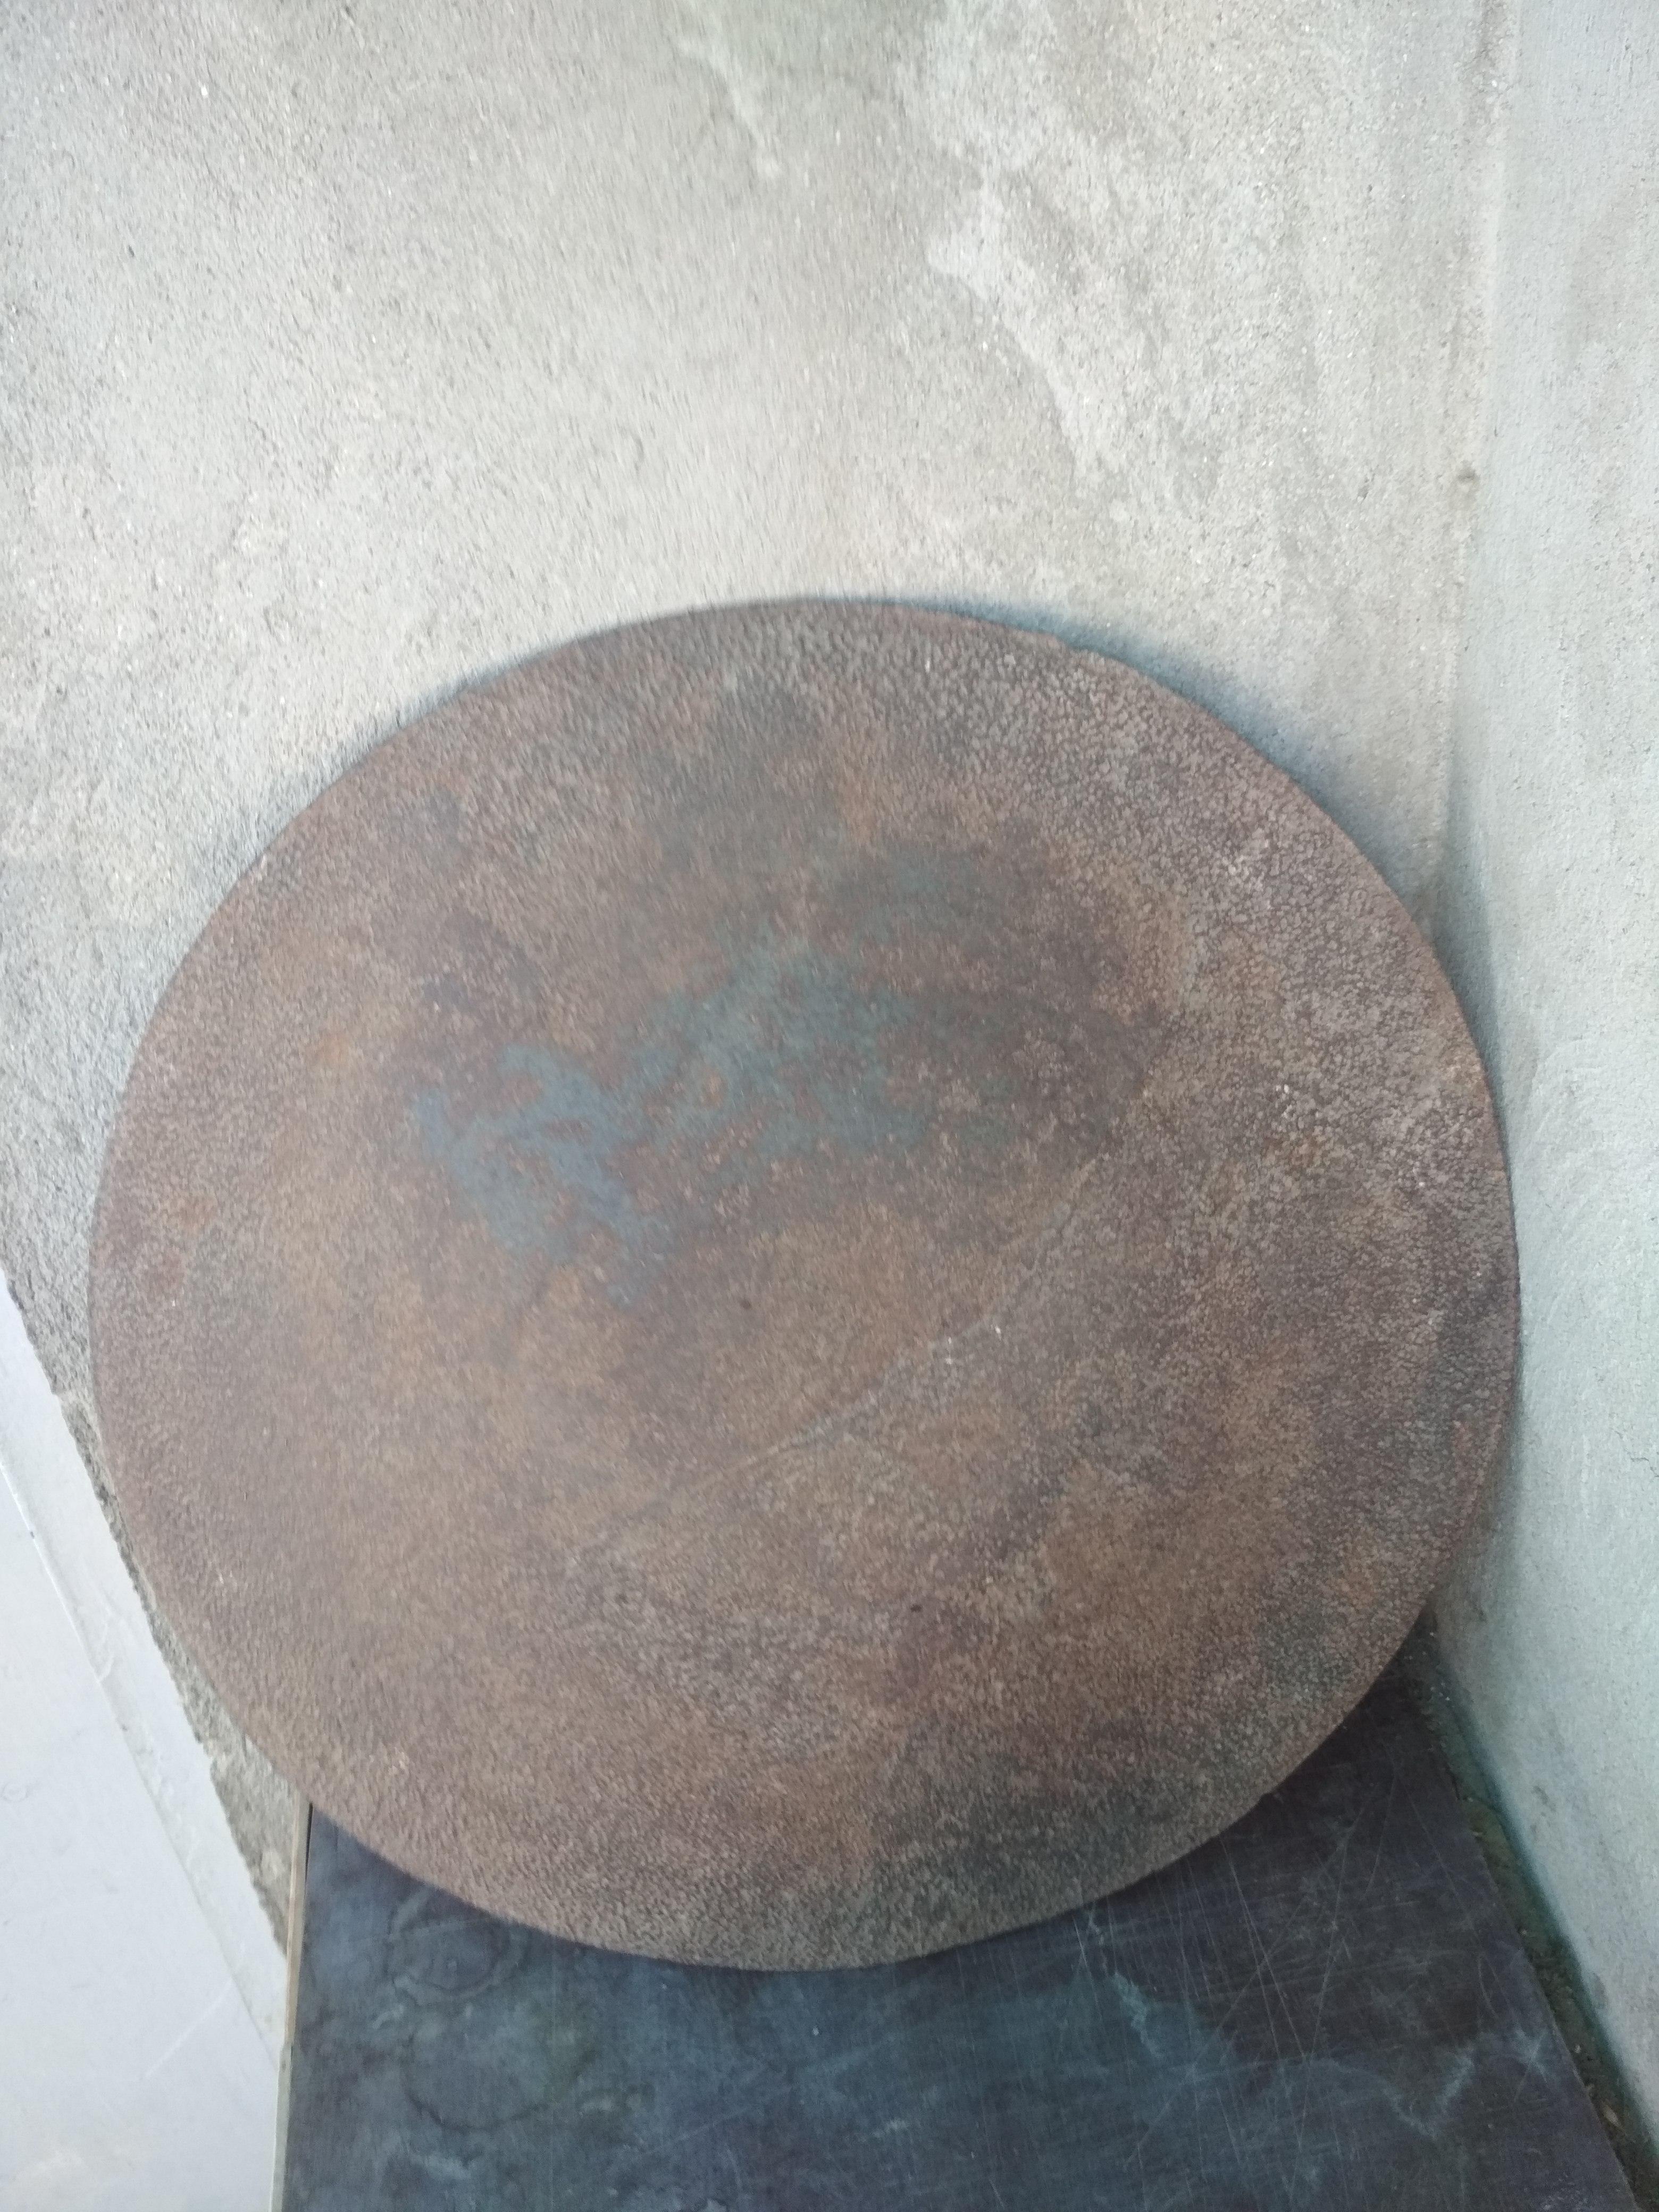 Sovet dövrünün sacı. Ağır qalın materialdandır. Diametri 43.5 sm.